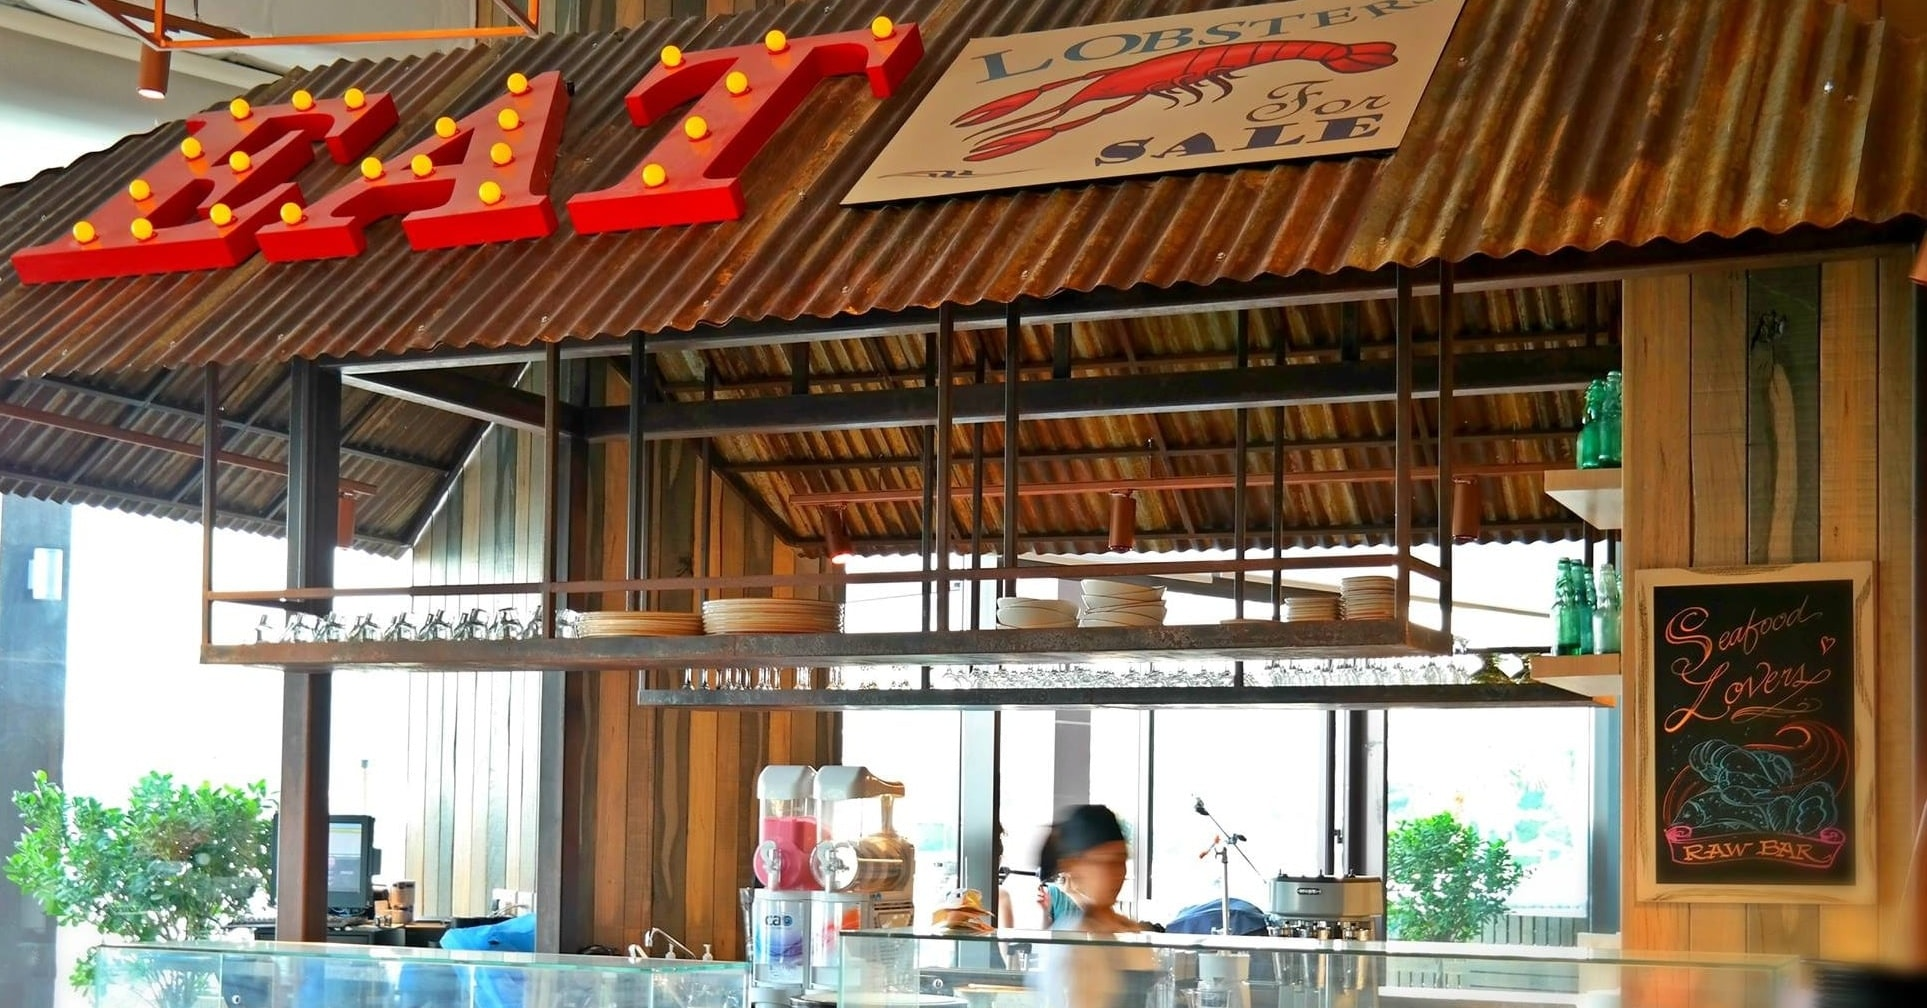 Breeze Beach Grill family friendly restaurants in Dubai